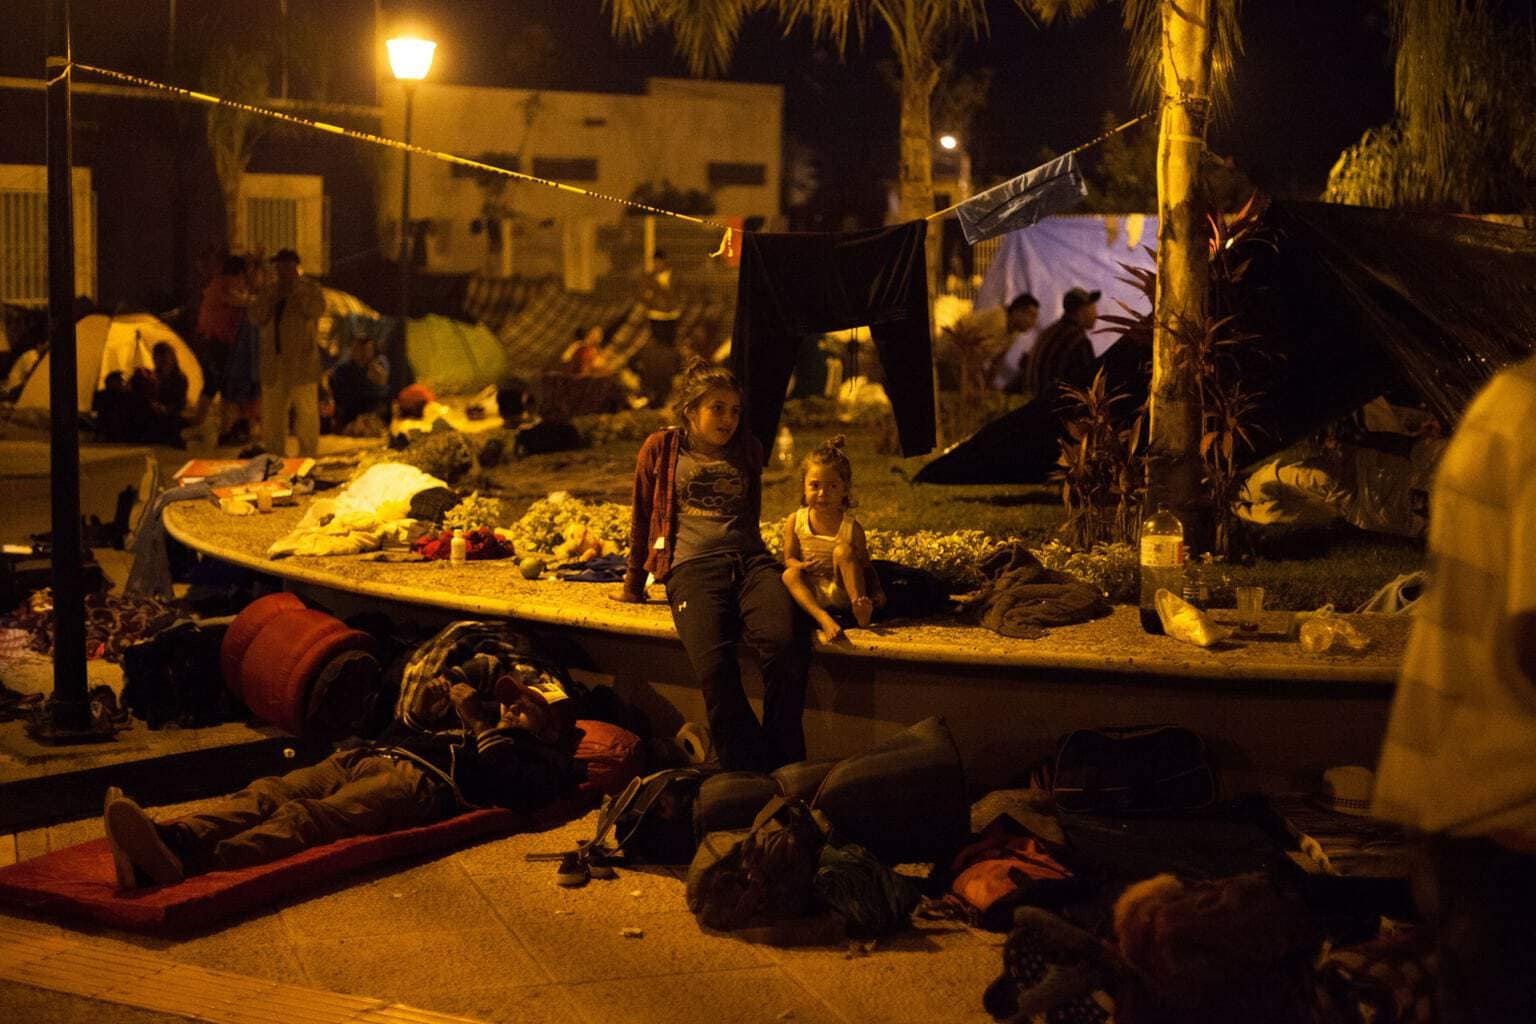 Sean Hawkey photo of the migrant caravan